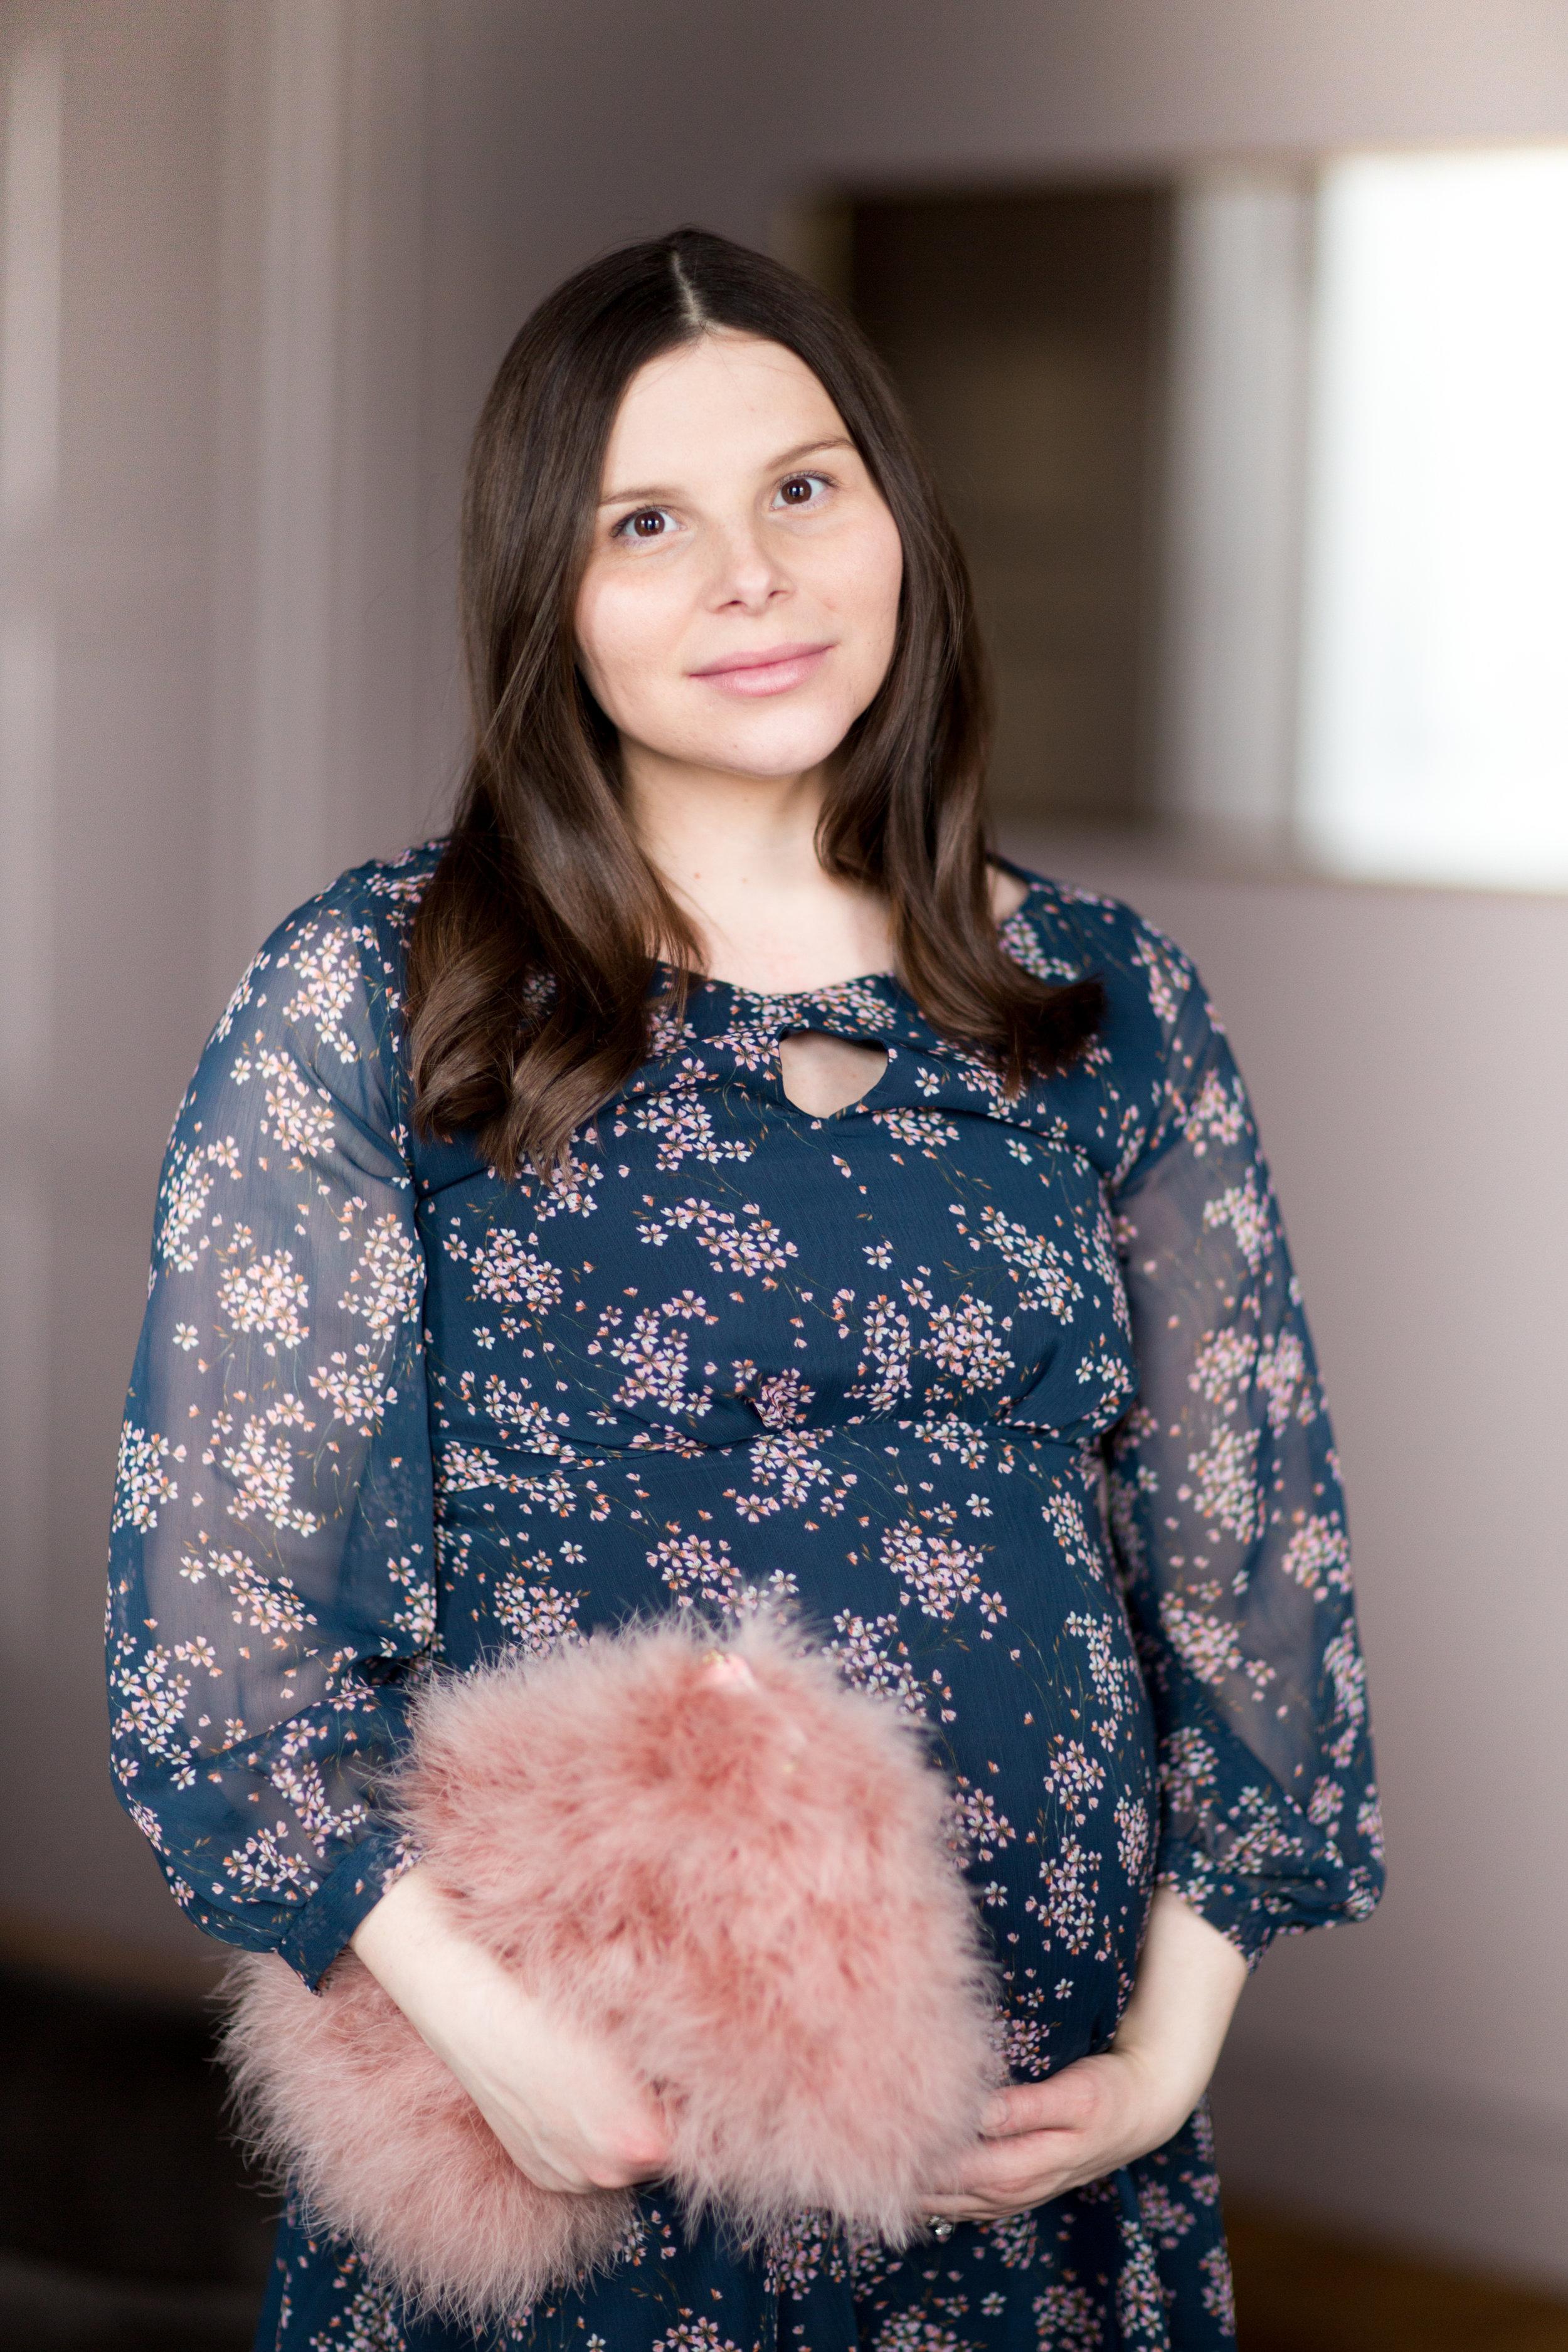 Angelica Aurell Angelicas Closet gravid gravidmode Tiffany Rose Pellobello.jpg